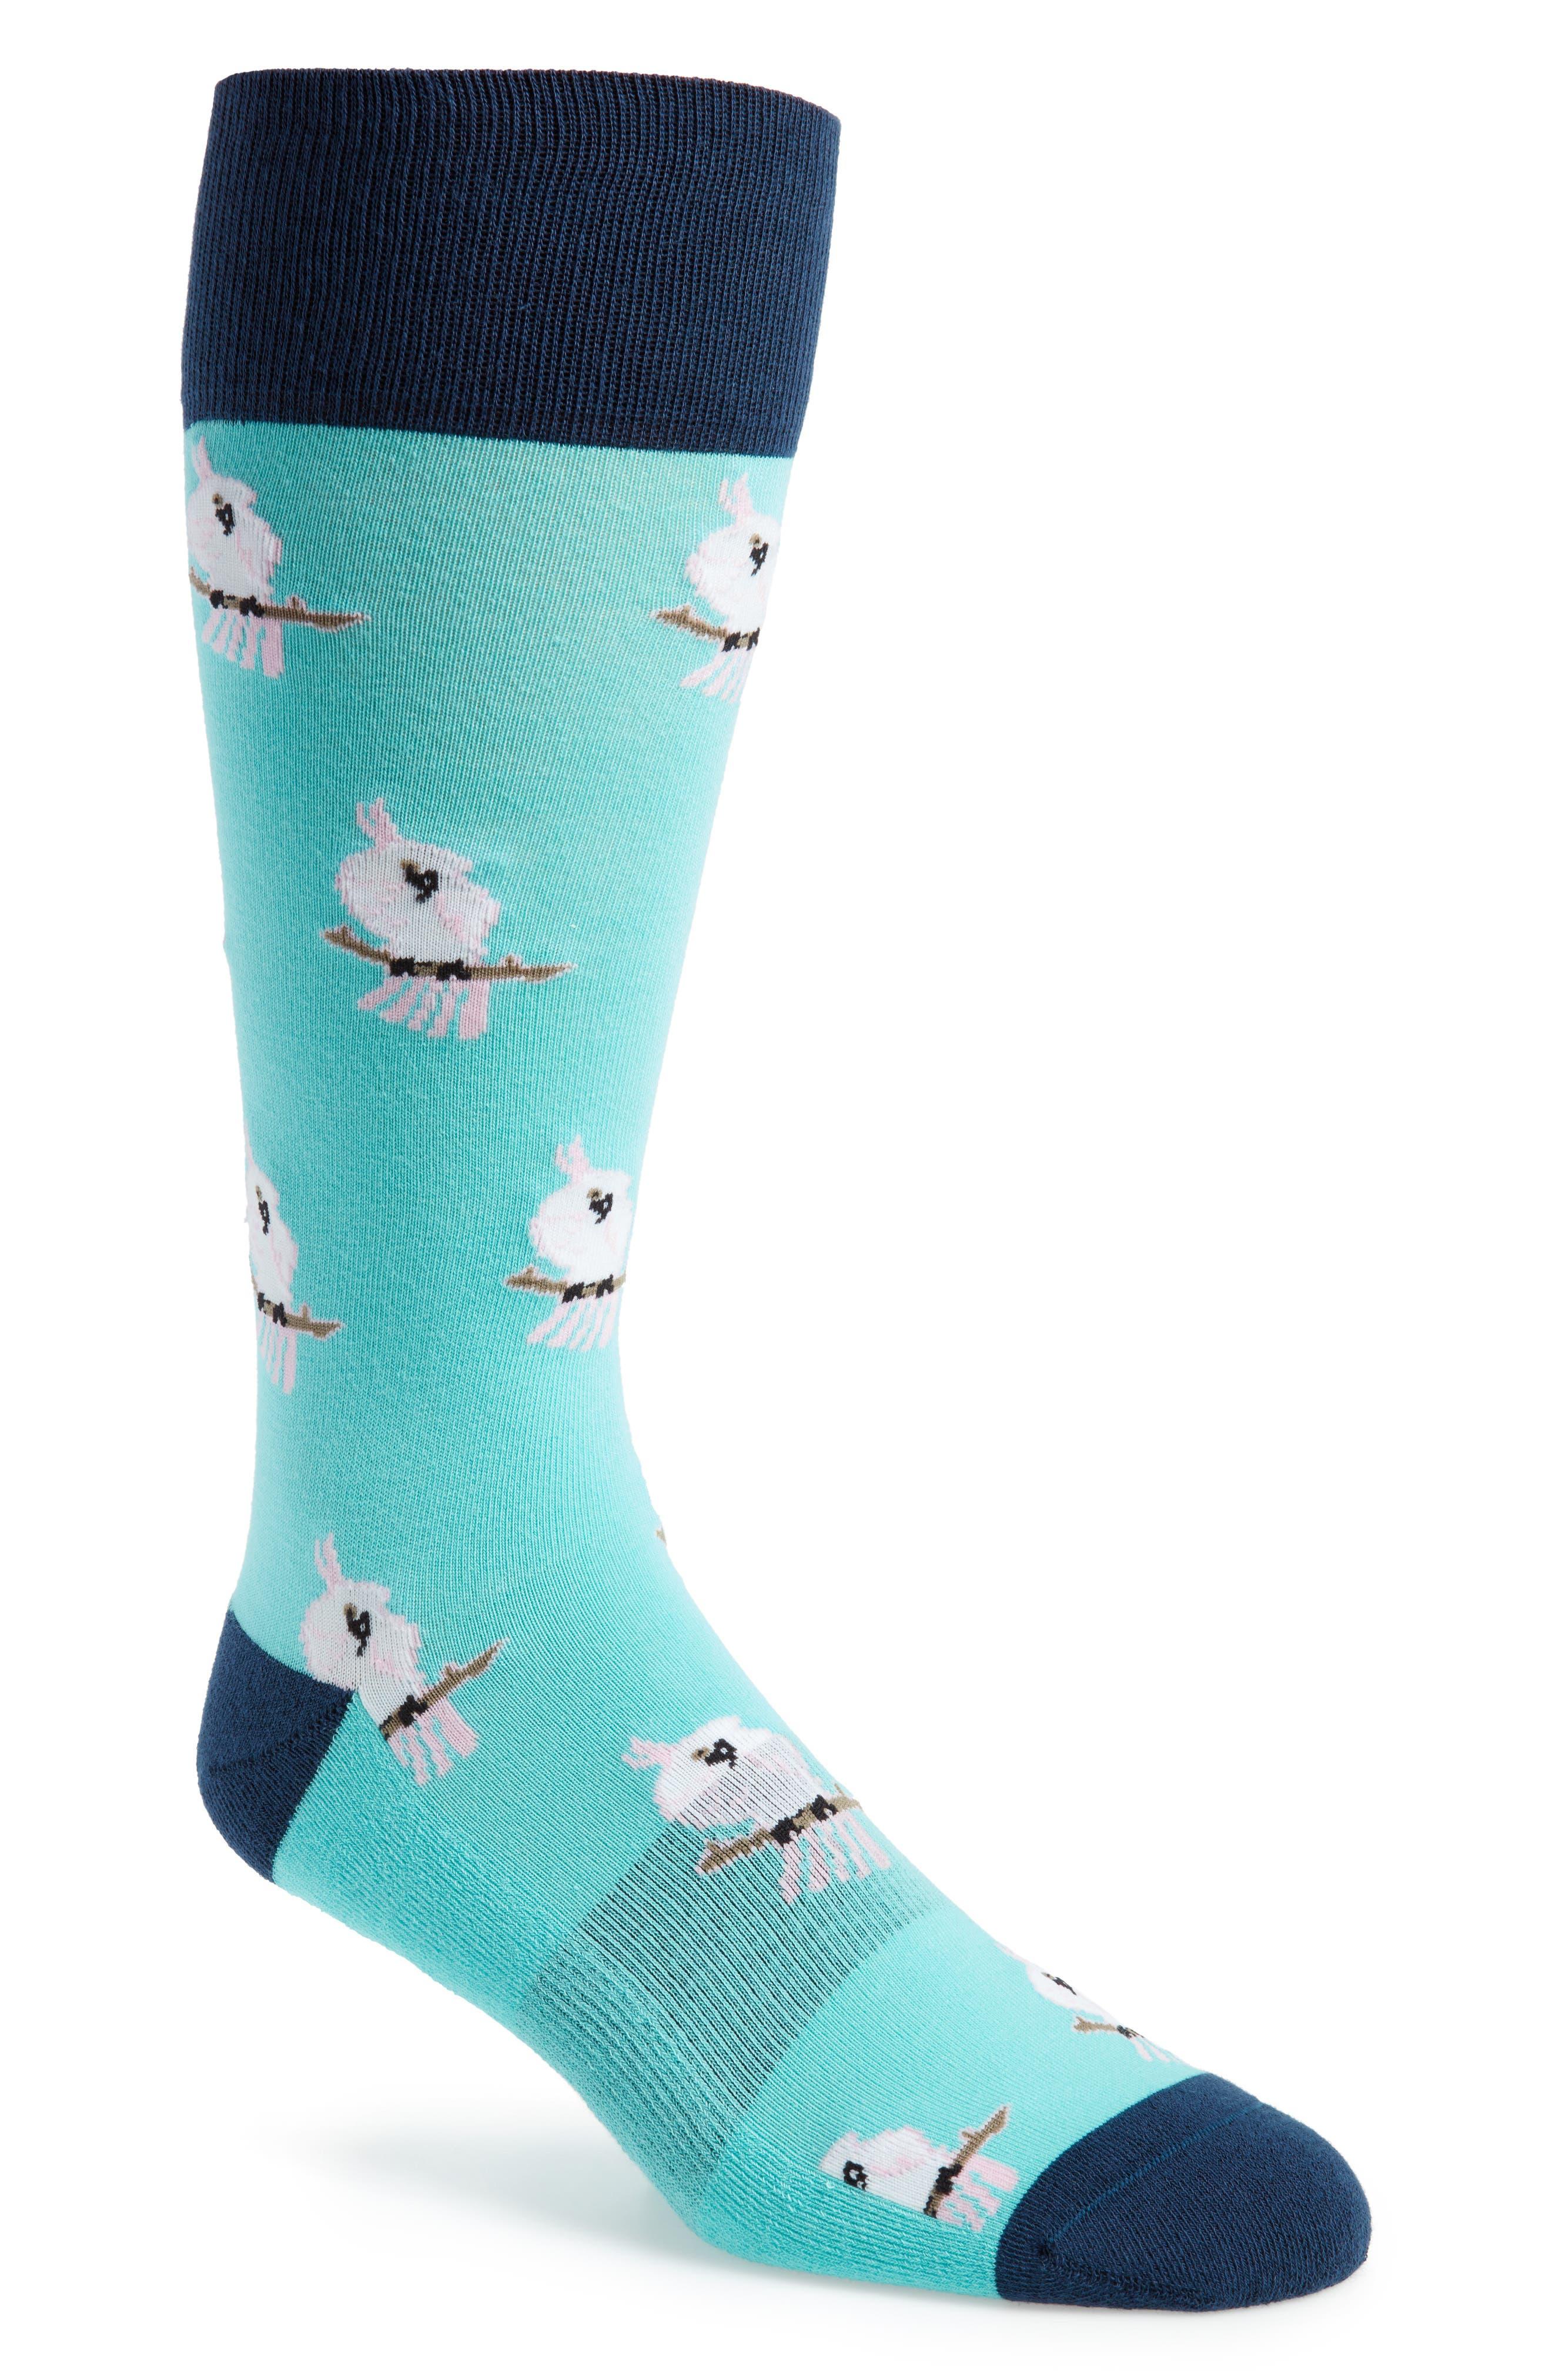 Cockatoo Socks,                         Main,                         color, NAVY/ TEAL